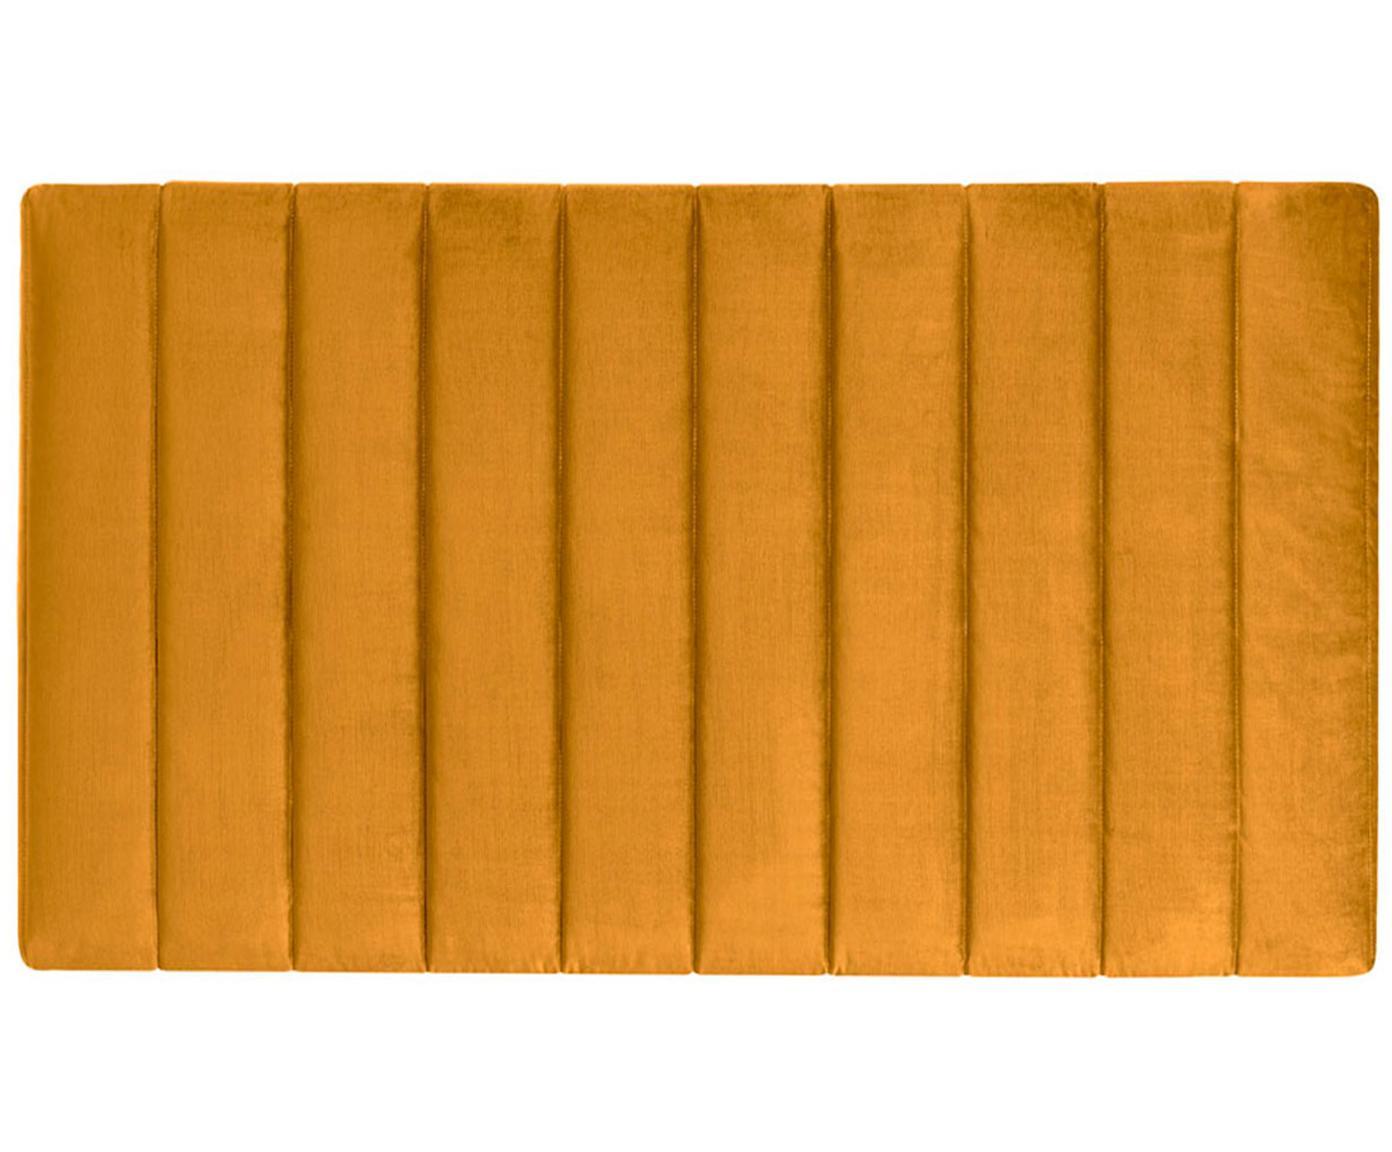 Cabecero Paris Stripe, Estructura: tablero de fibras de dens, Tapizado: 100%poliéster efecto ter, Interior: guata doble 500g (100%p, Mostaza, An 135 x Al 80 cm